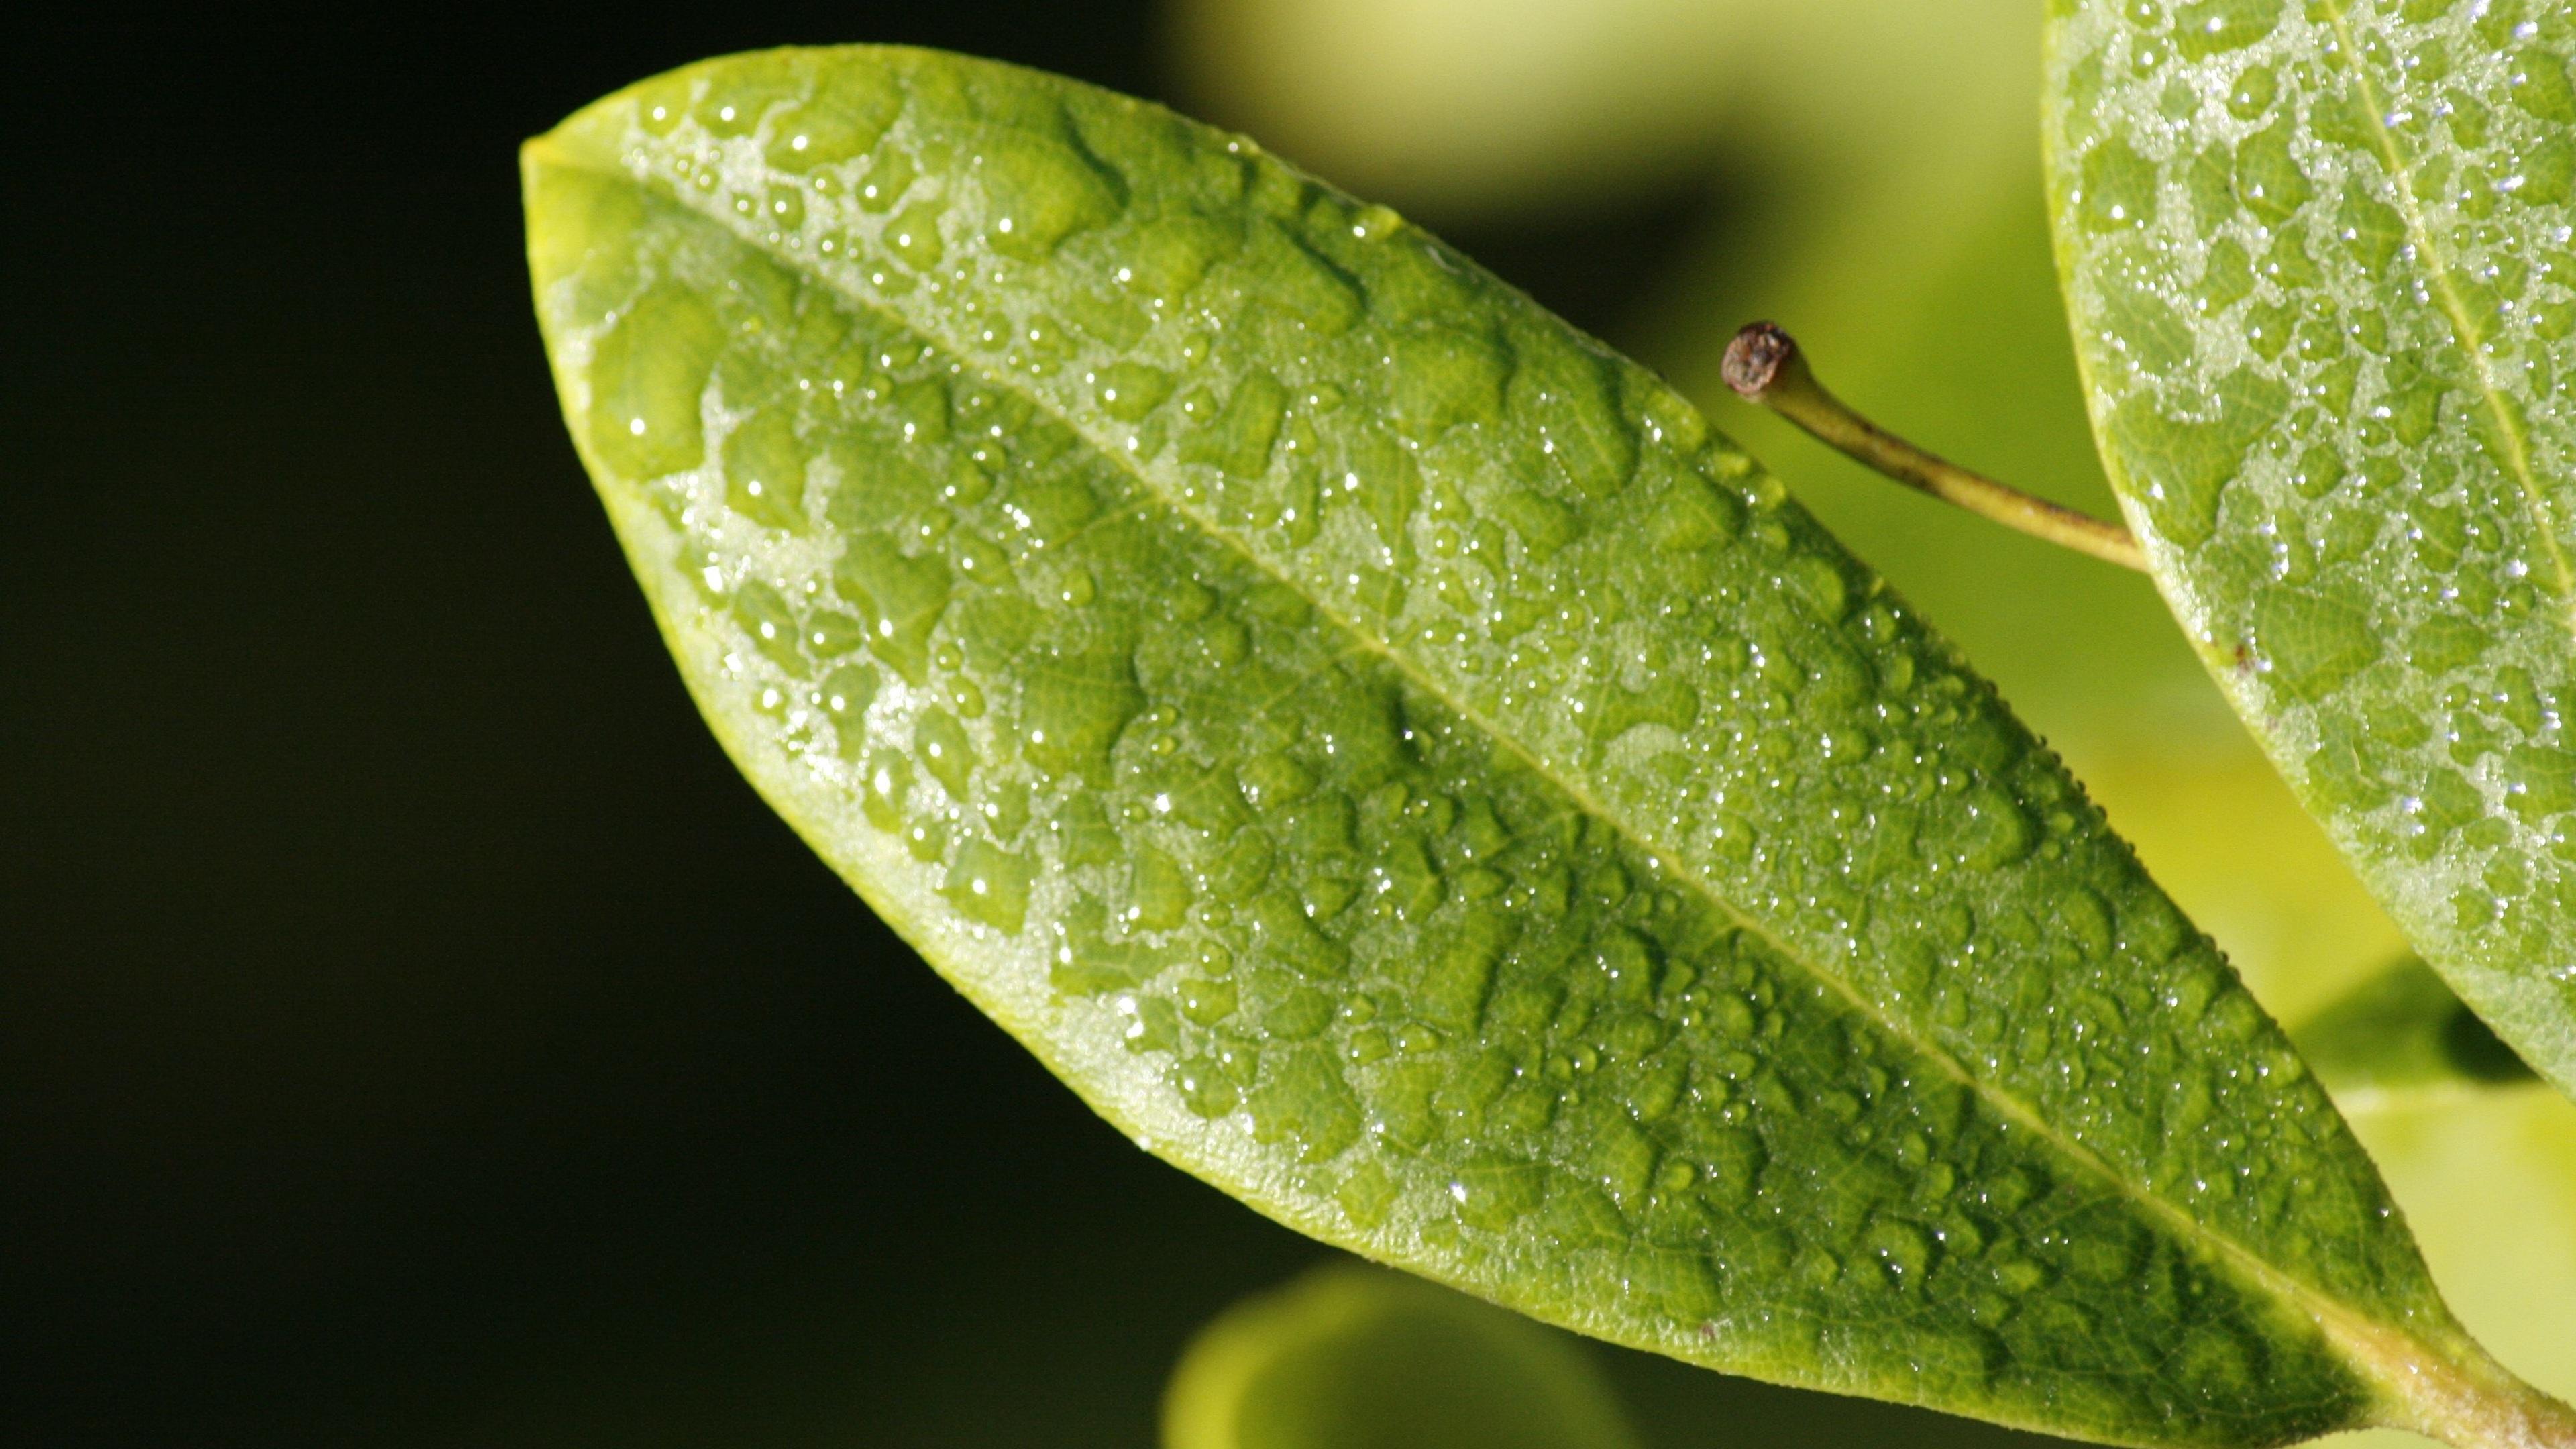 leaf drop dew surface 4k 1540131100 - Leaf Drop Dew Surface 4k - nature wallpapers, macro wallpapers, leaf wallpapers, drop wallpapers